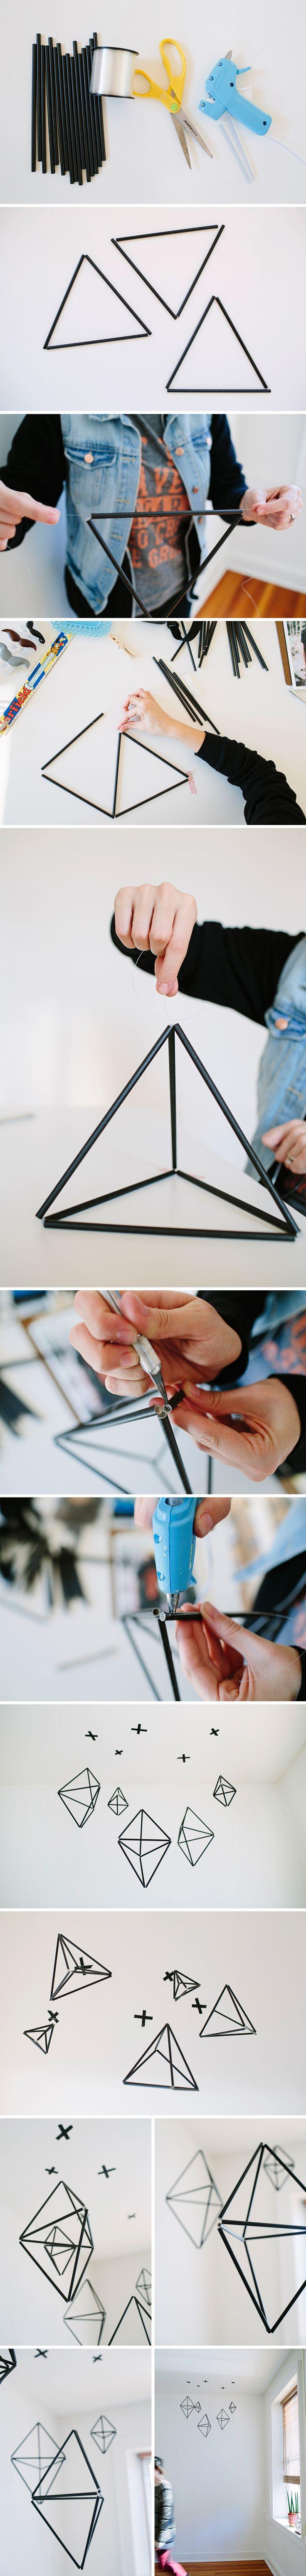 DIY Geometric Straw Mobile